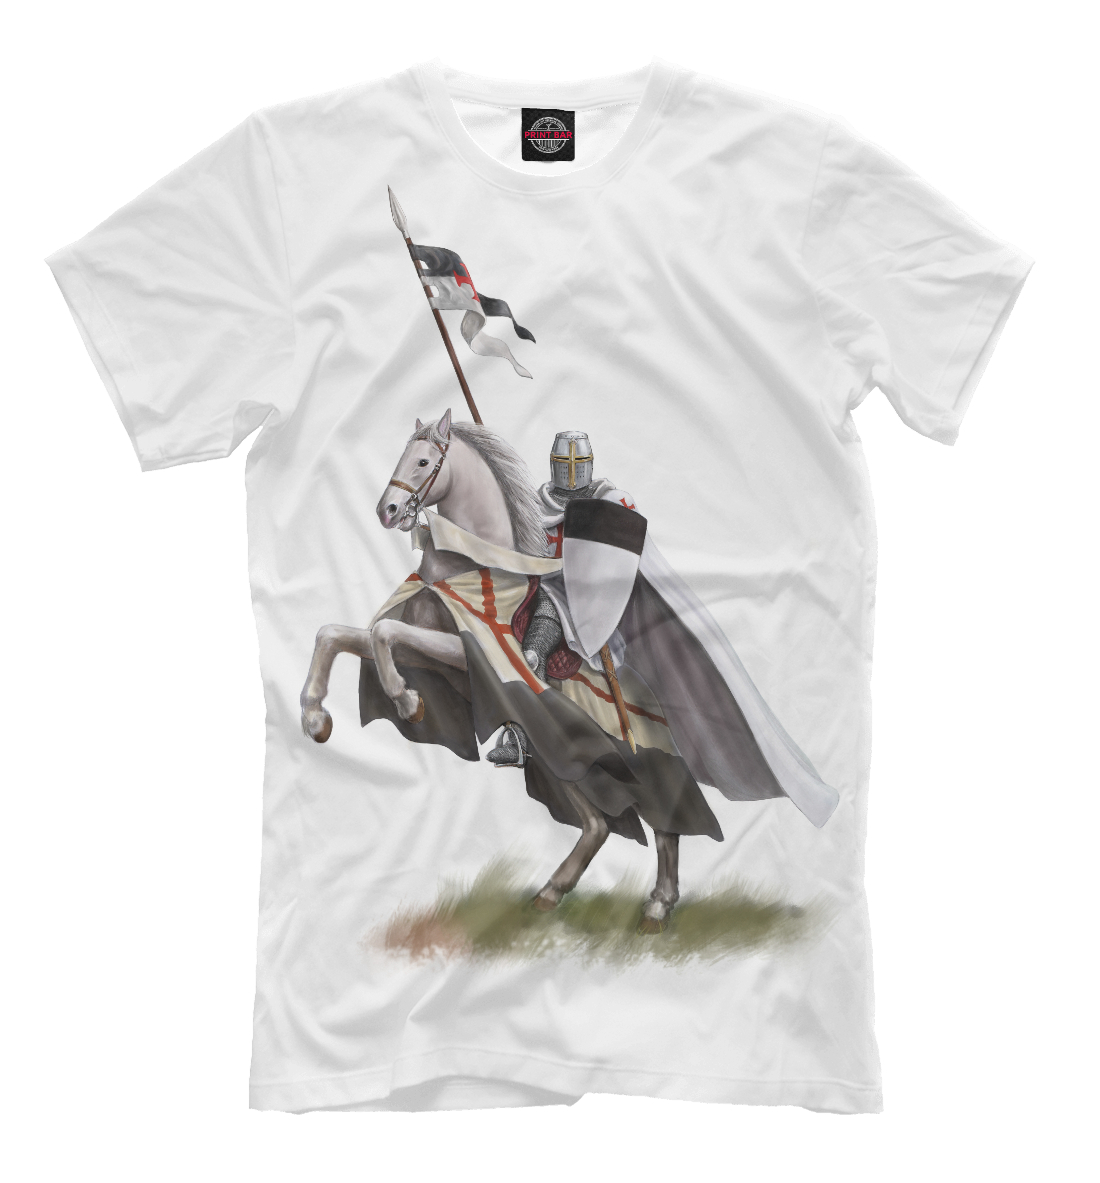 Рыцарь на коне федоров м ю два всадника на одном коне